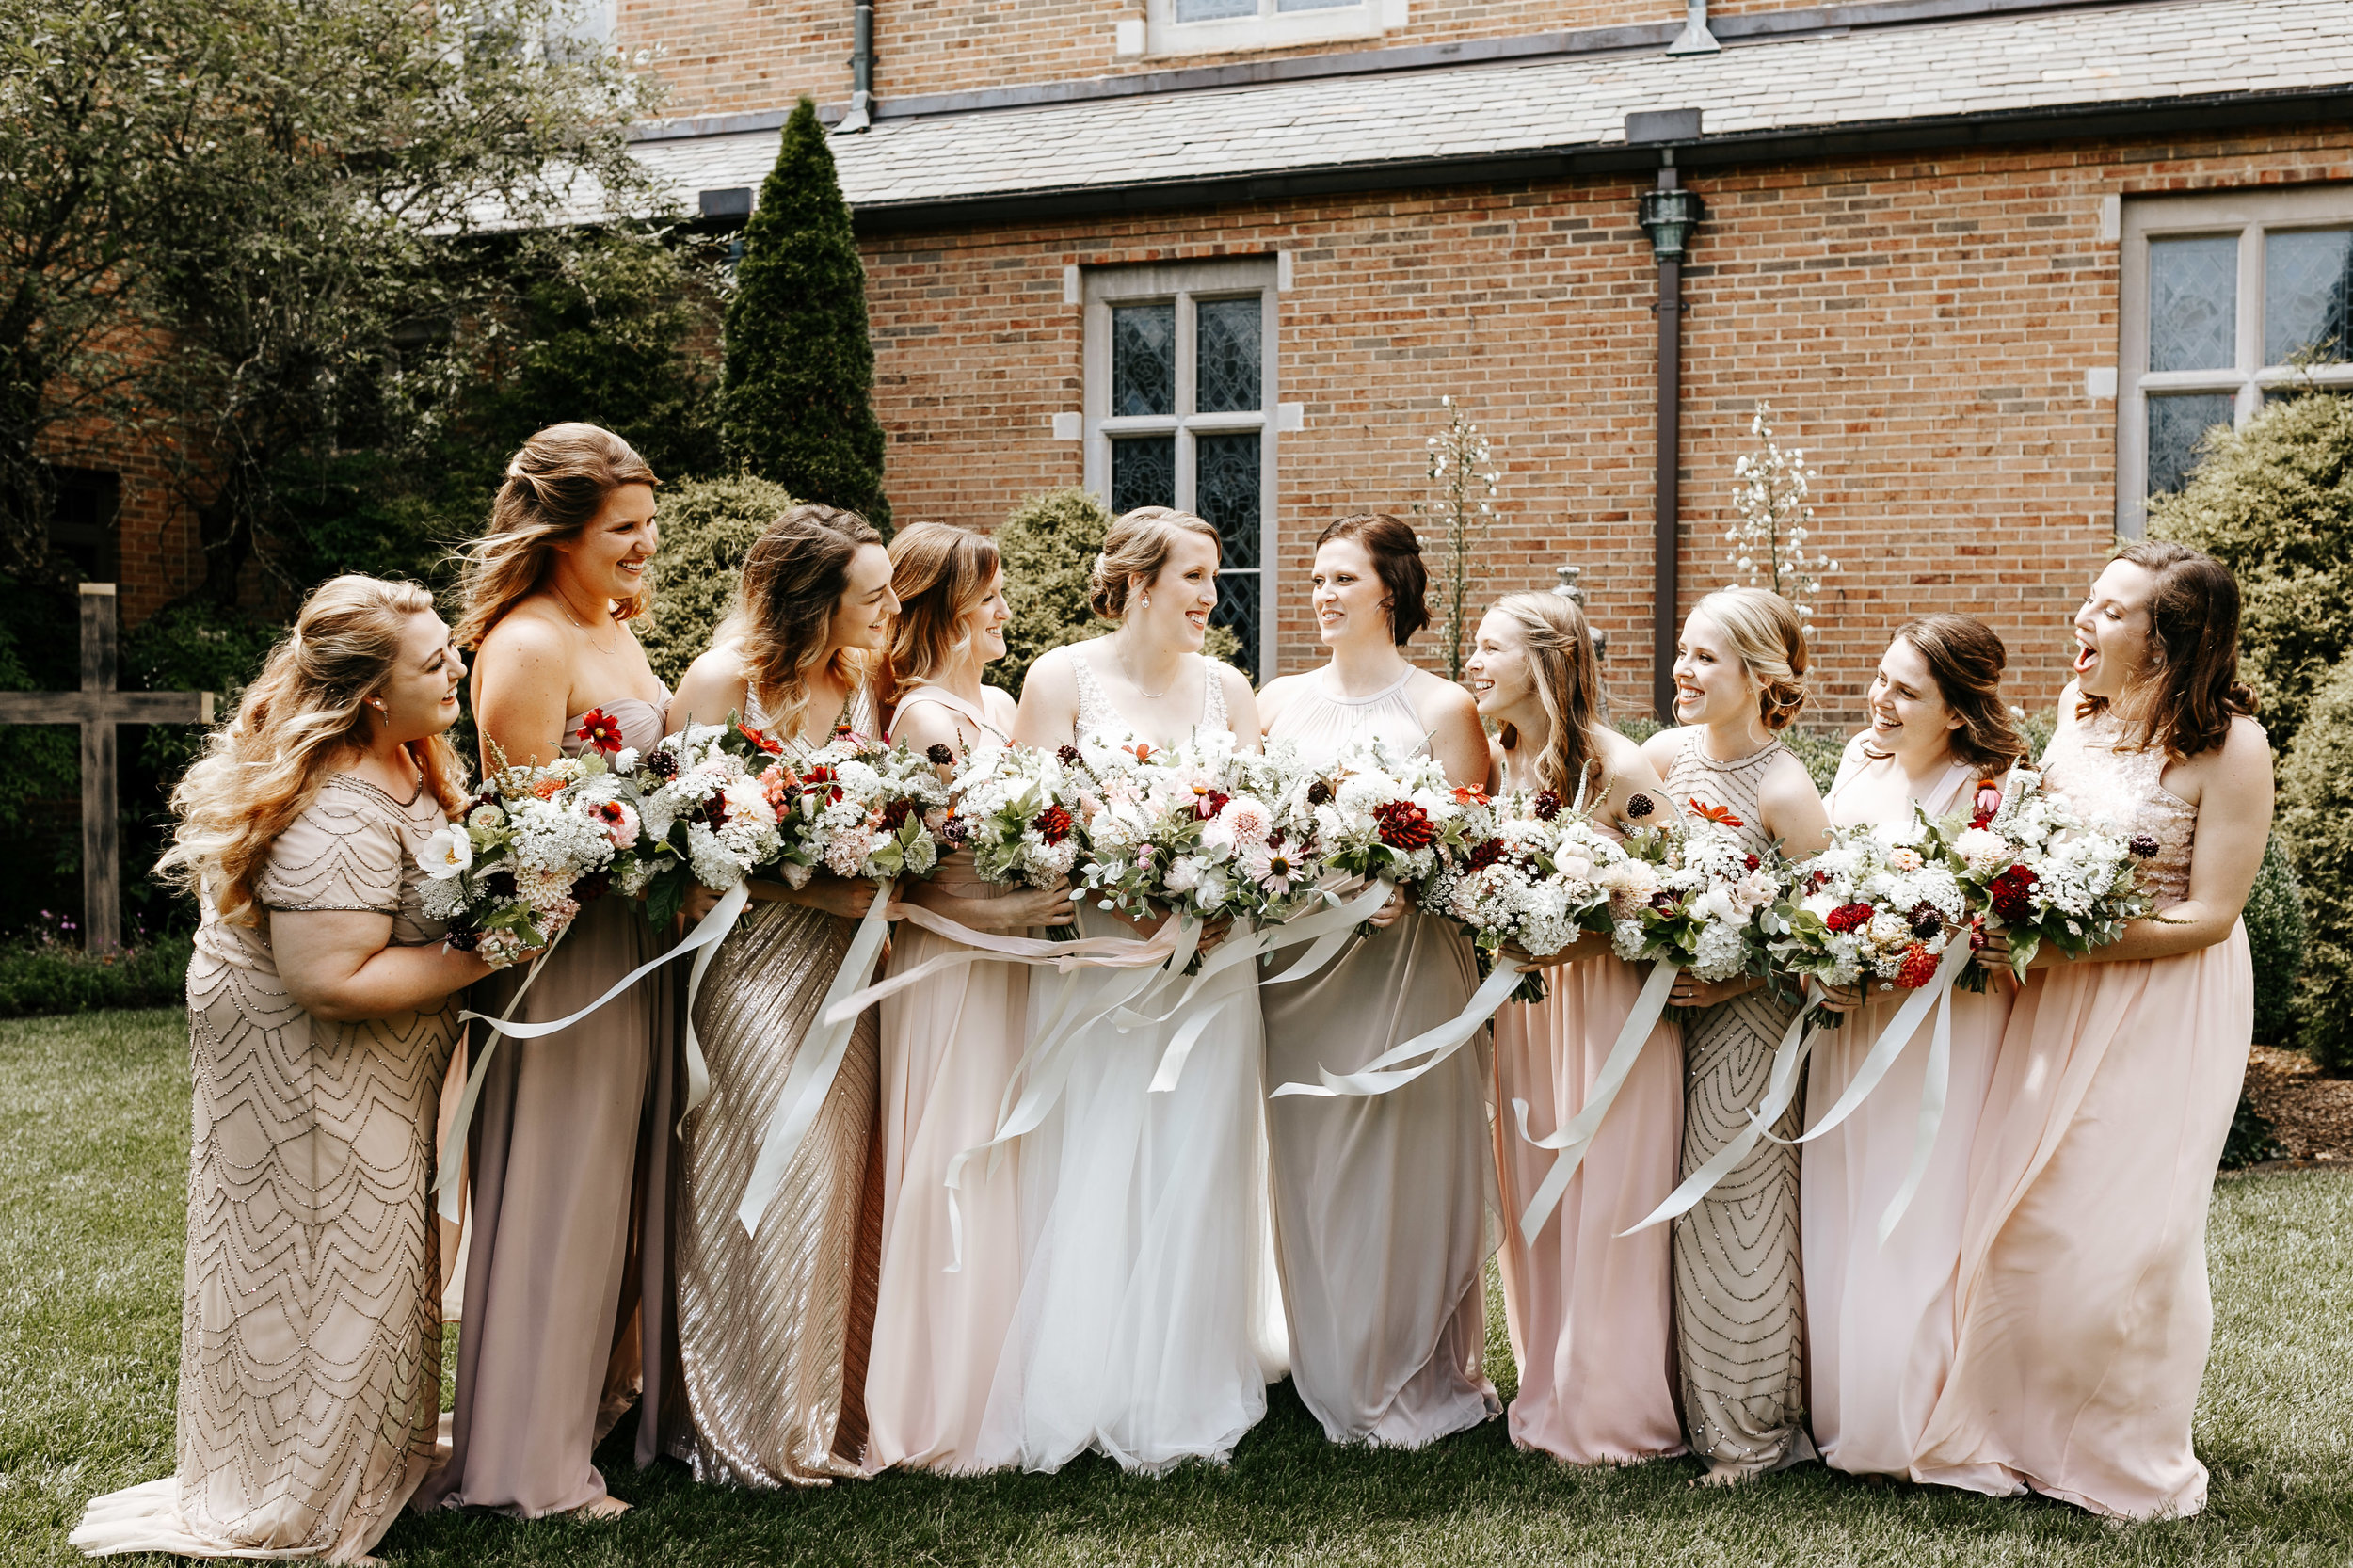 bohemian-photographer-wedding-tennessee-12.jpg